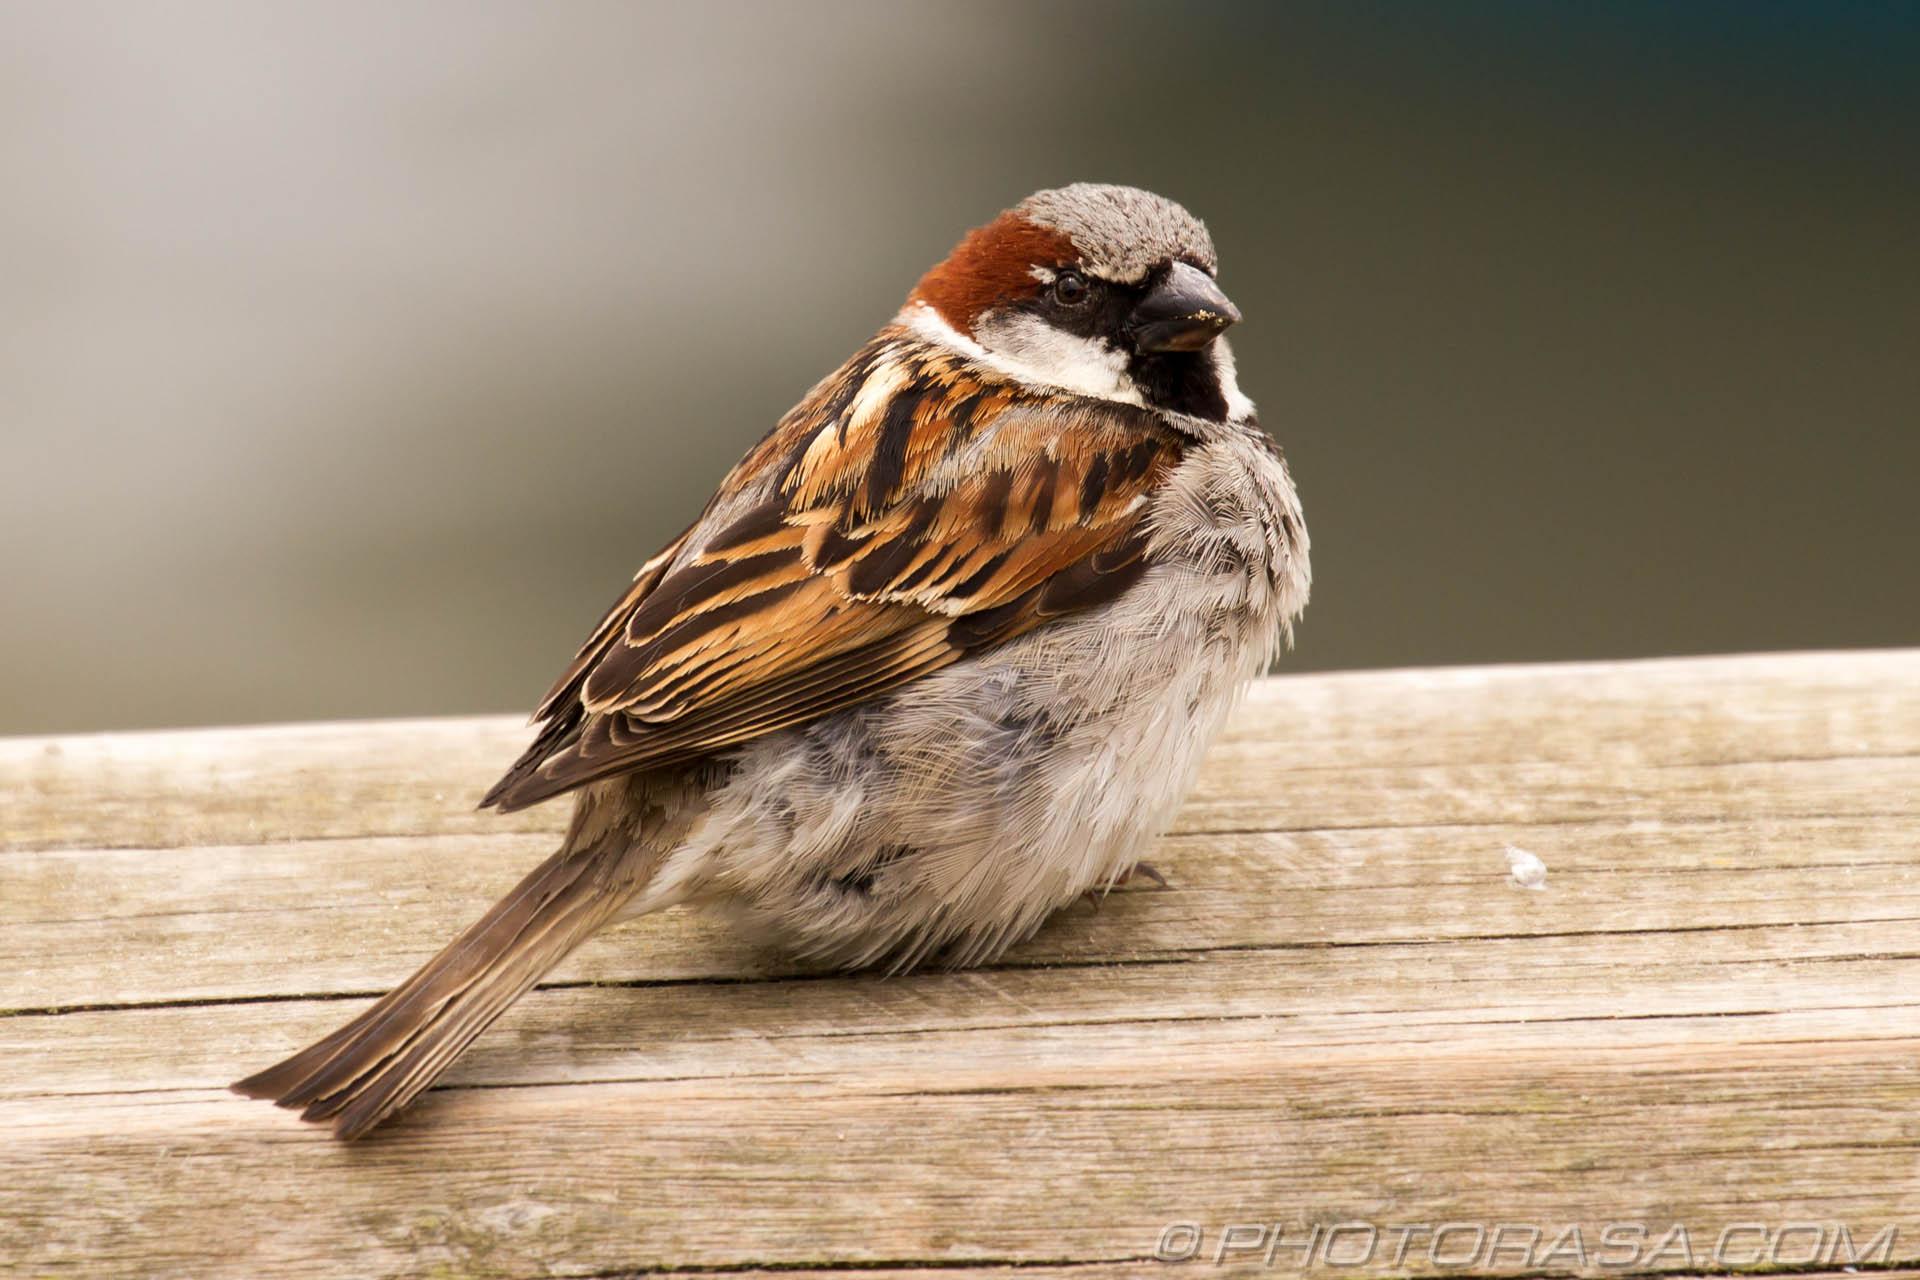 http://photorasa.com/sparrows/sparrow-by-the-sea/